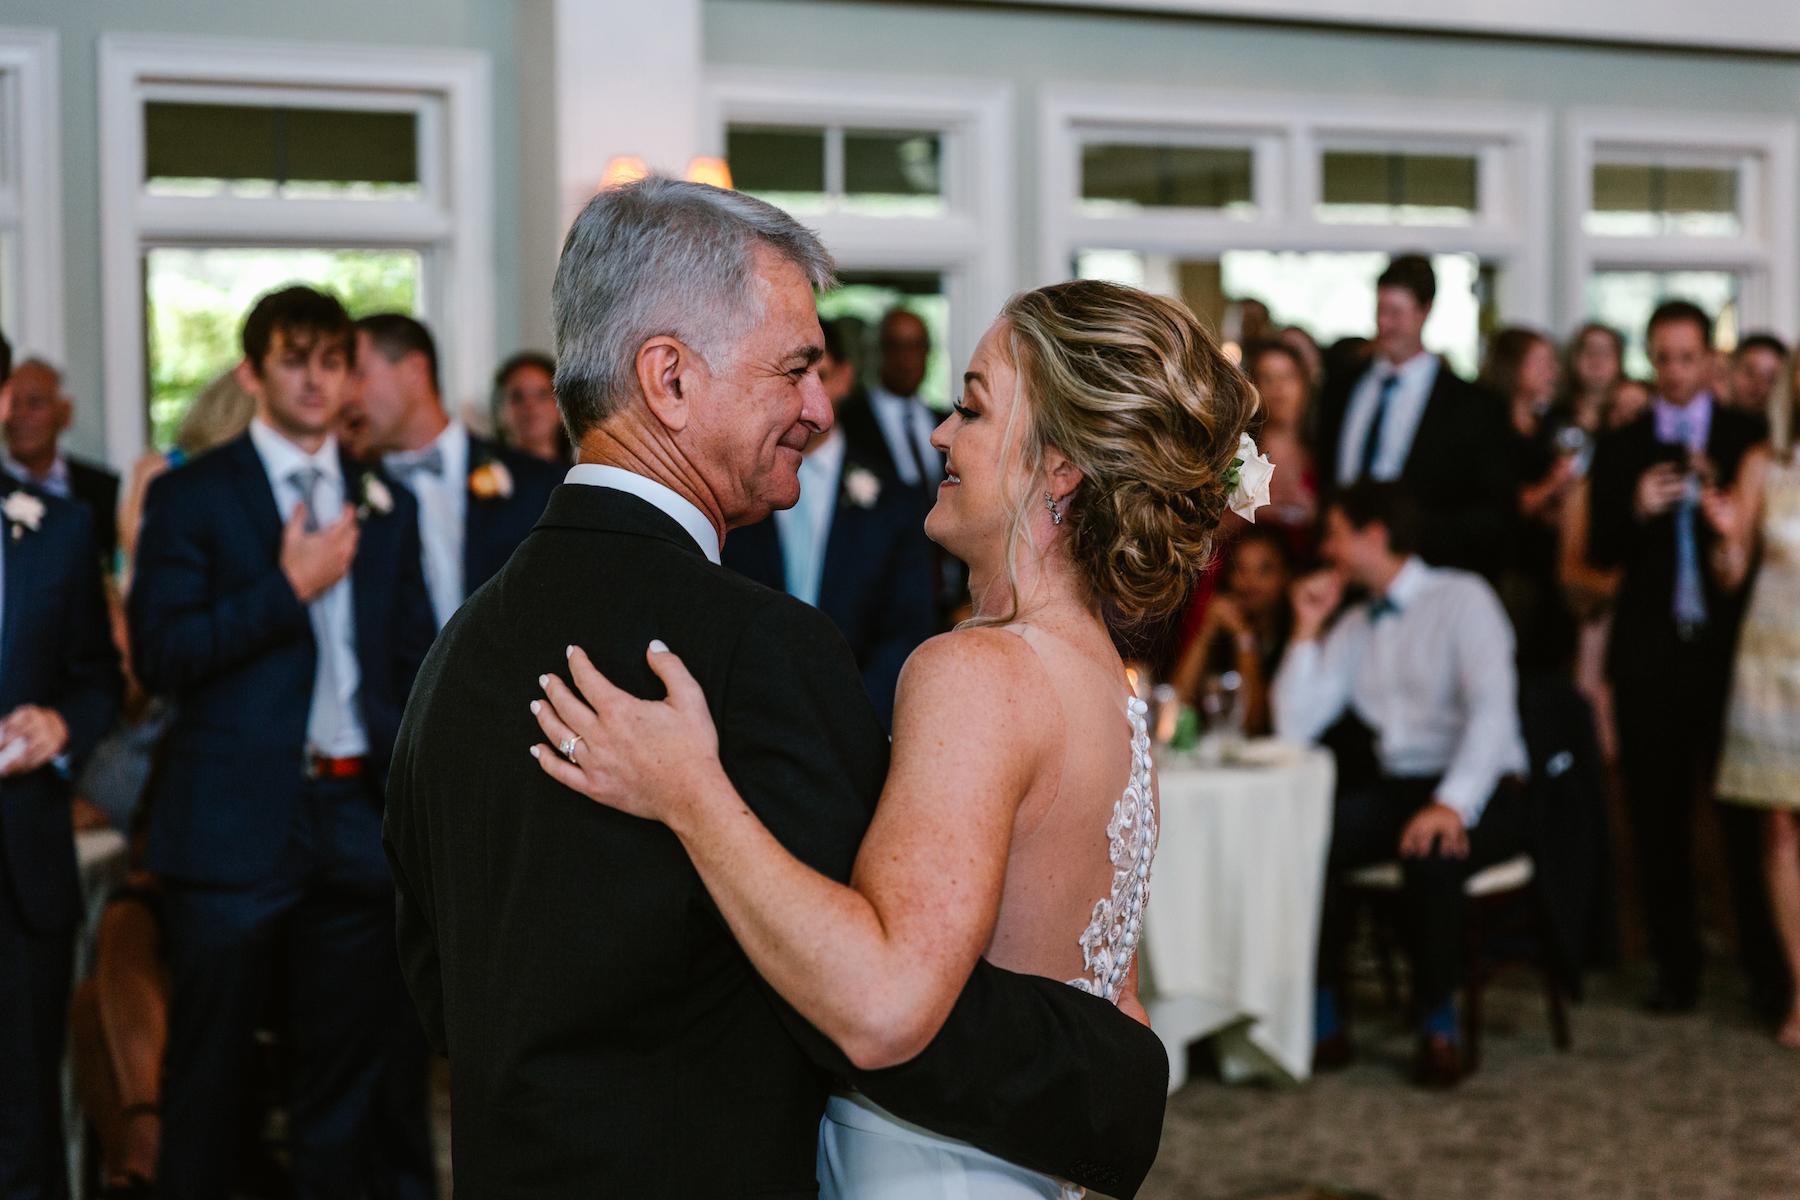 wedding-engagement-photographer-spartanburg-greenville-columbia-carolina-south-north-515.JPG